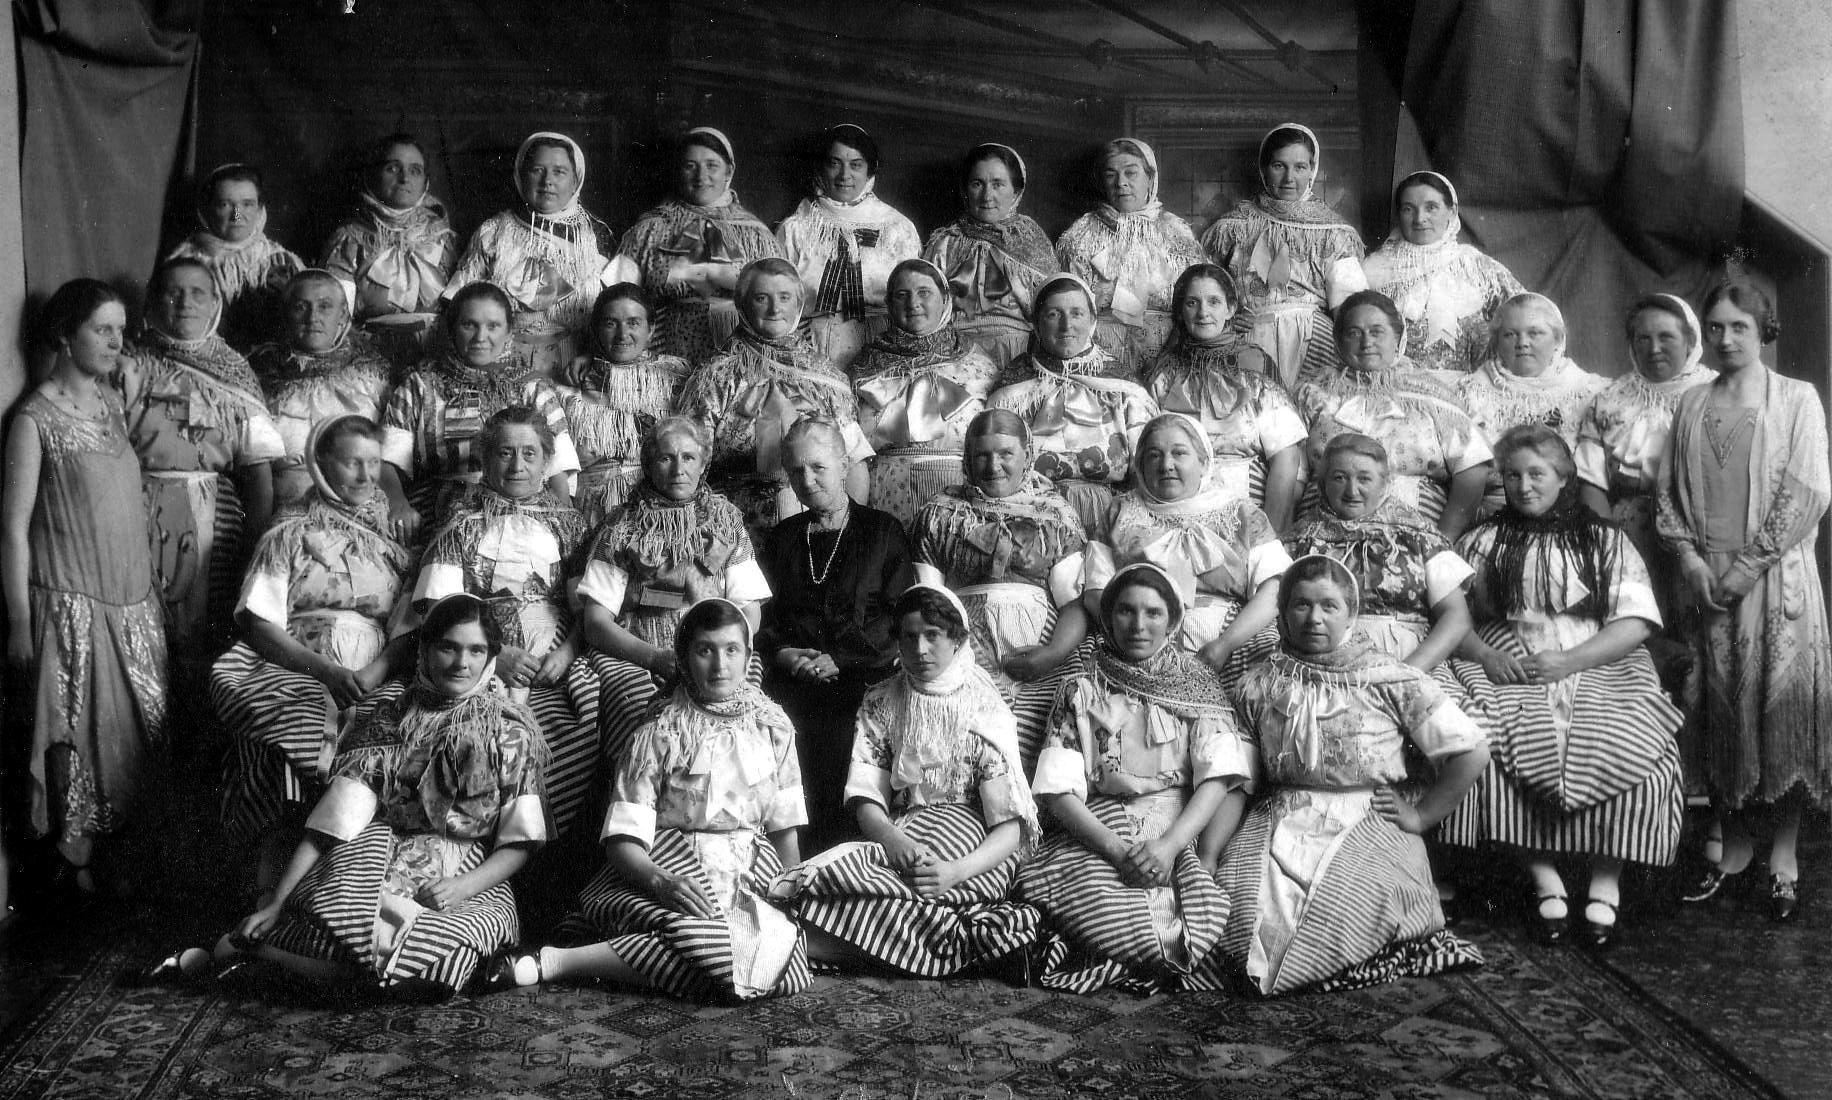 Newhaven Fishwives Choir 1920s